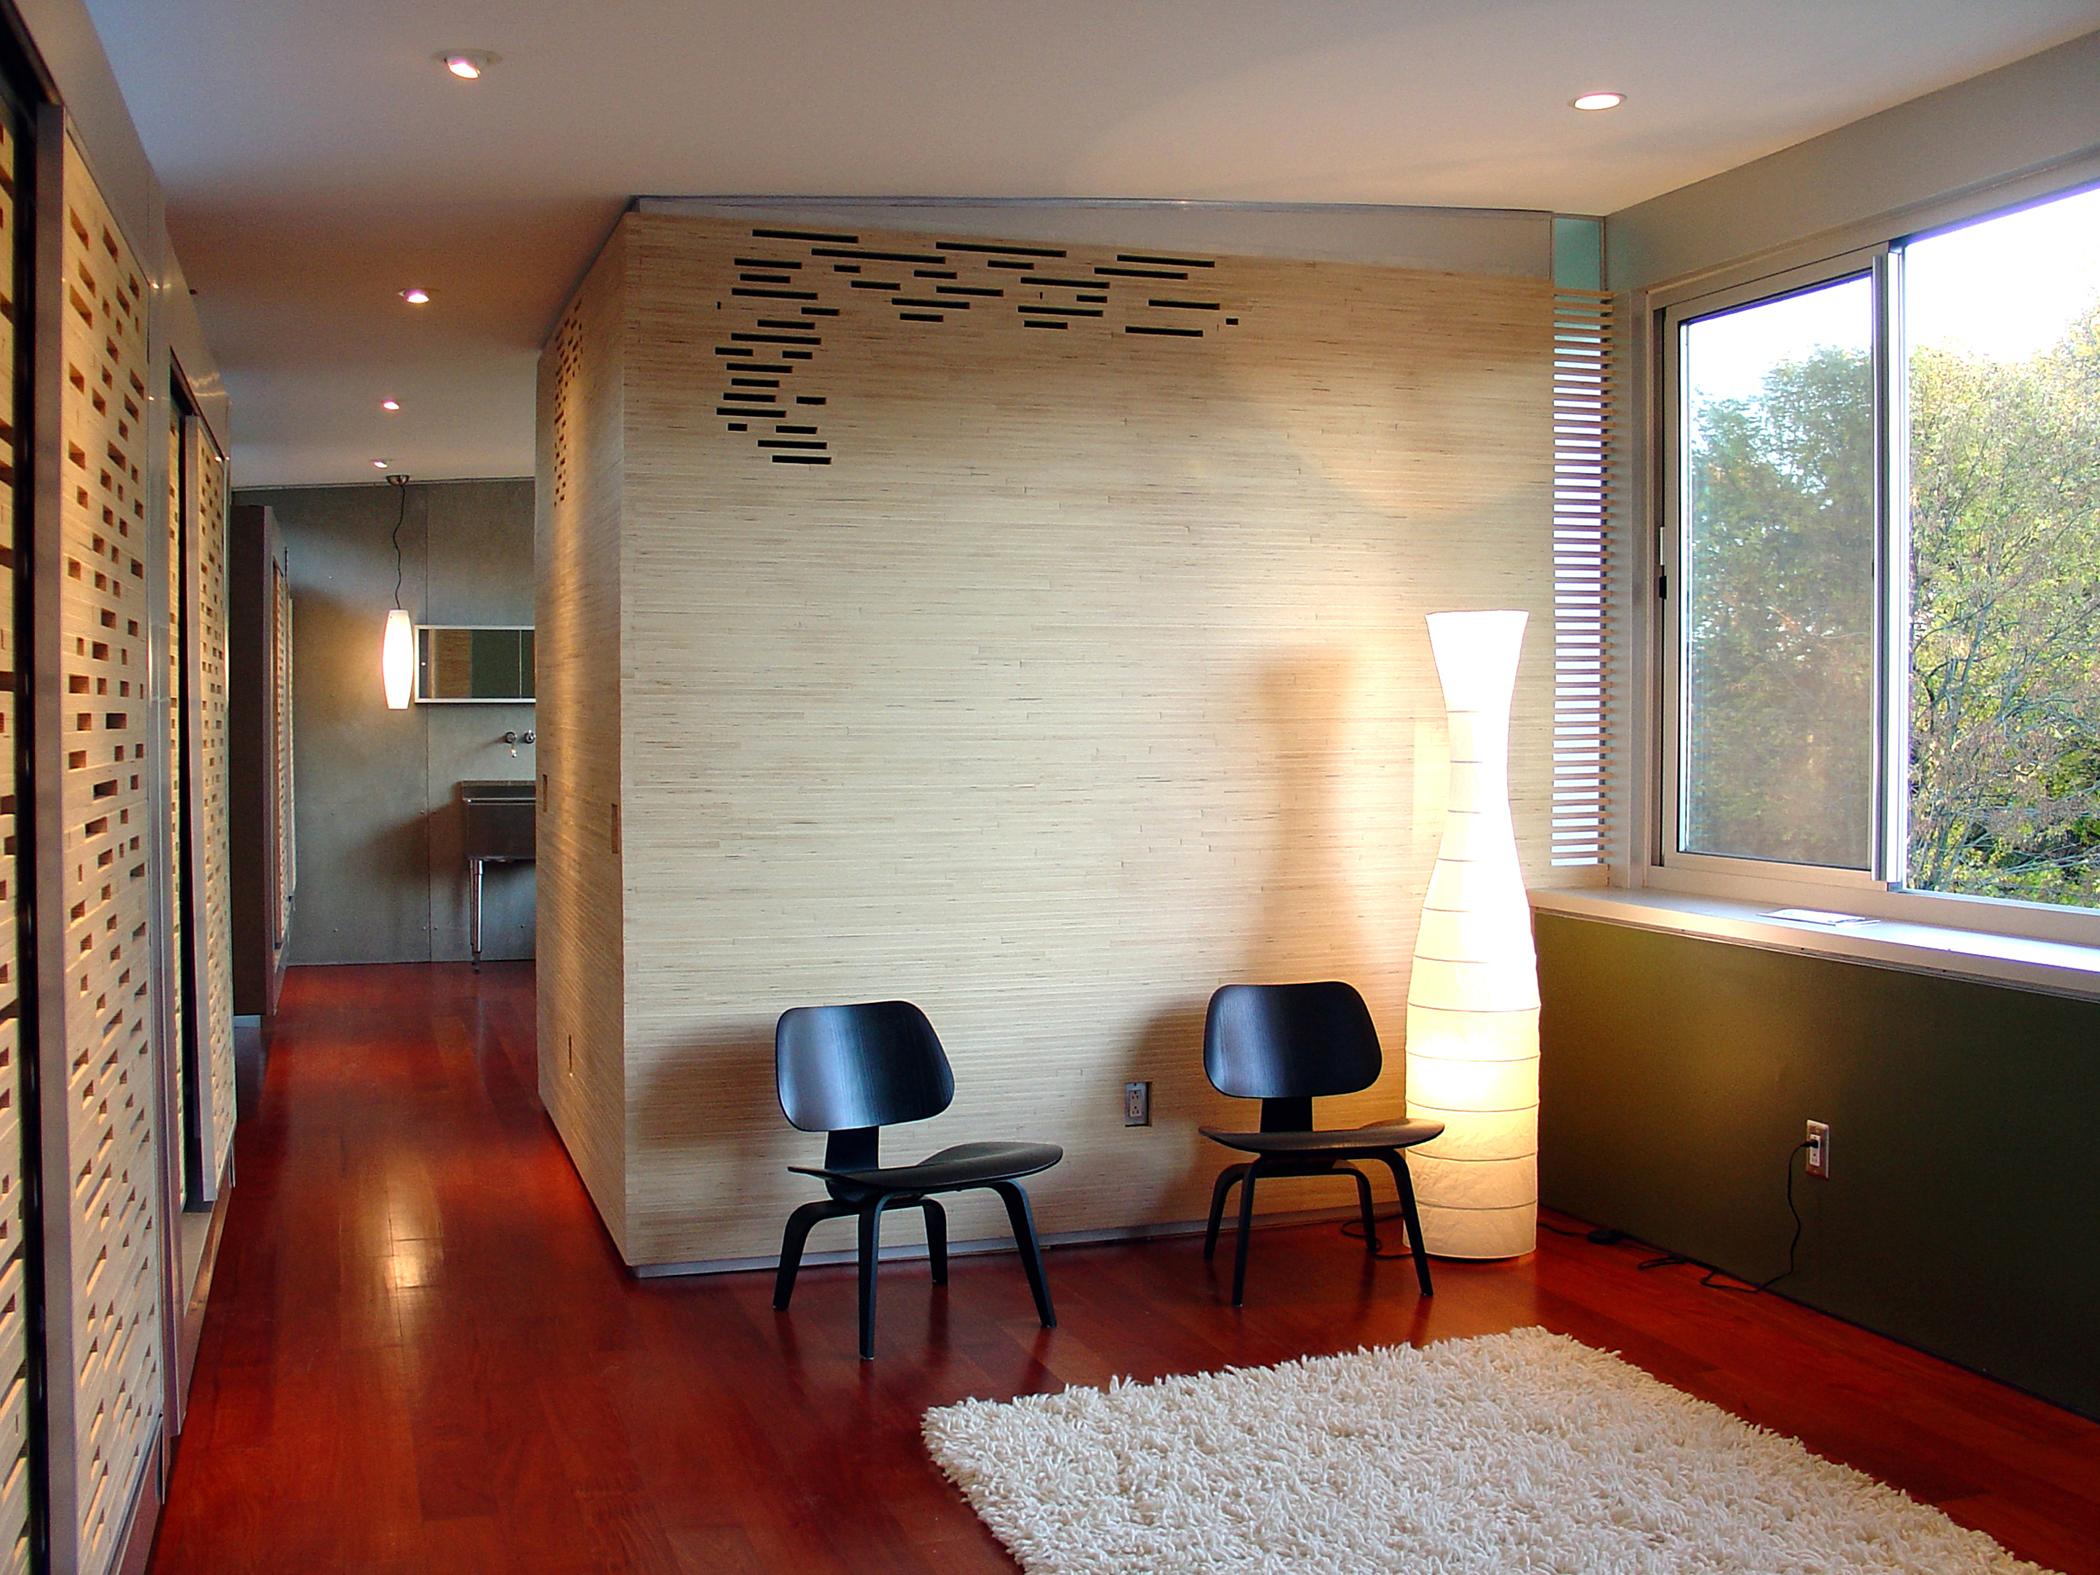 3_bedroom.jpg